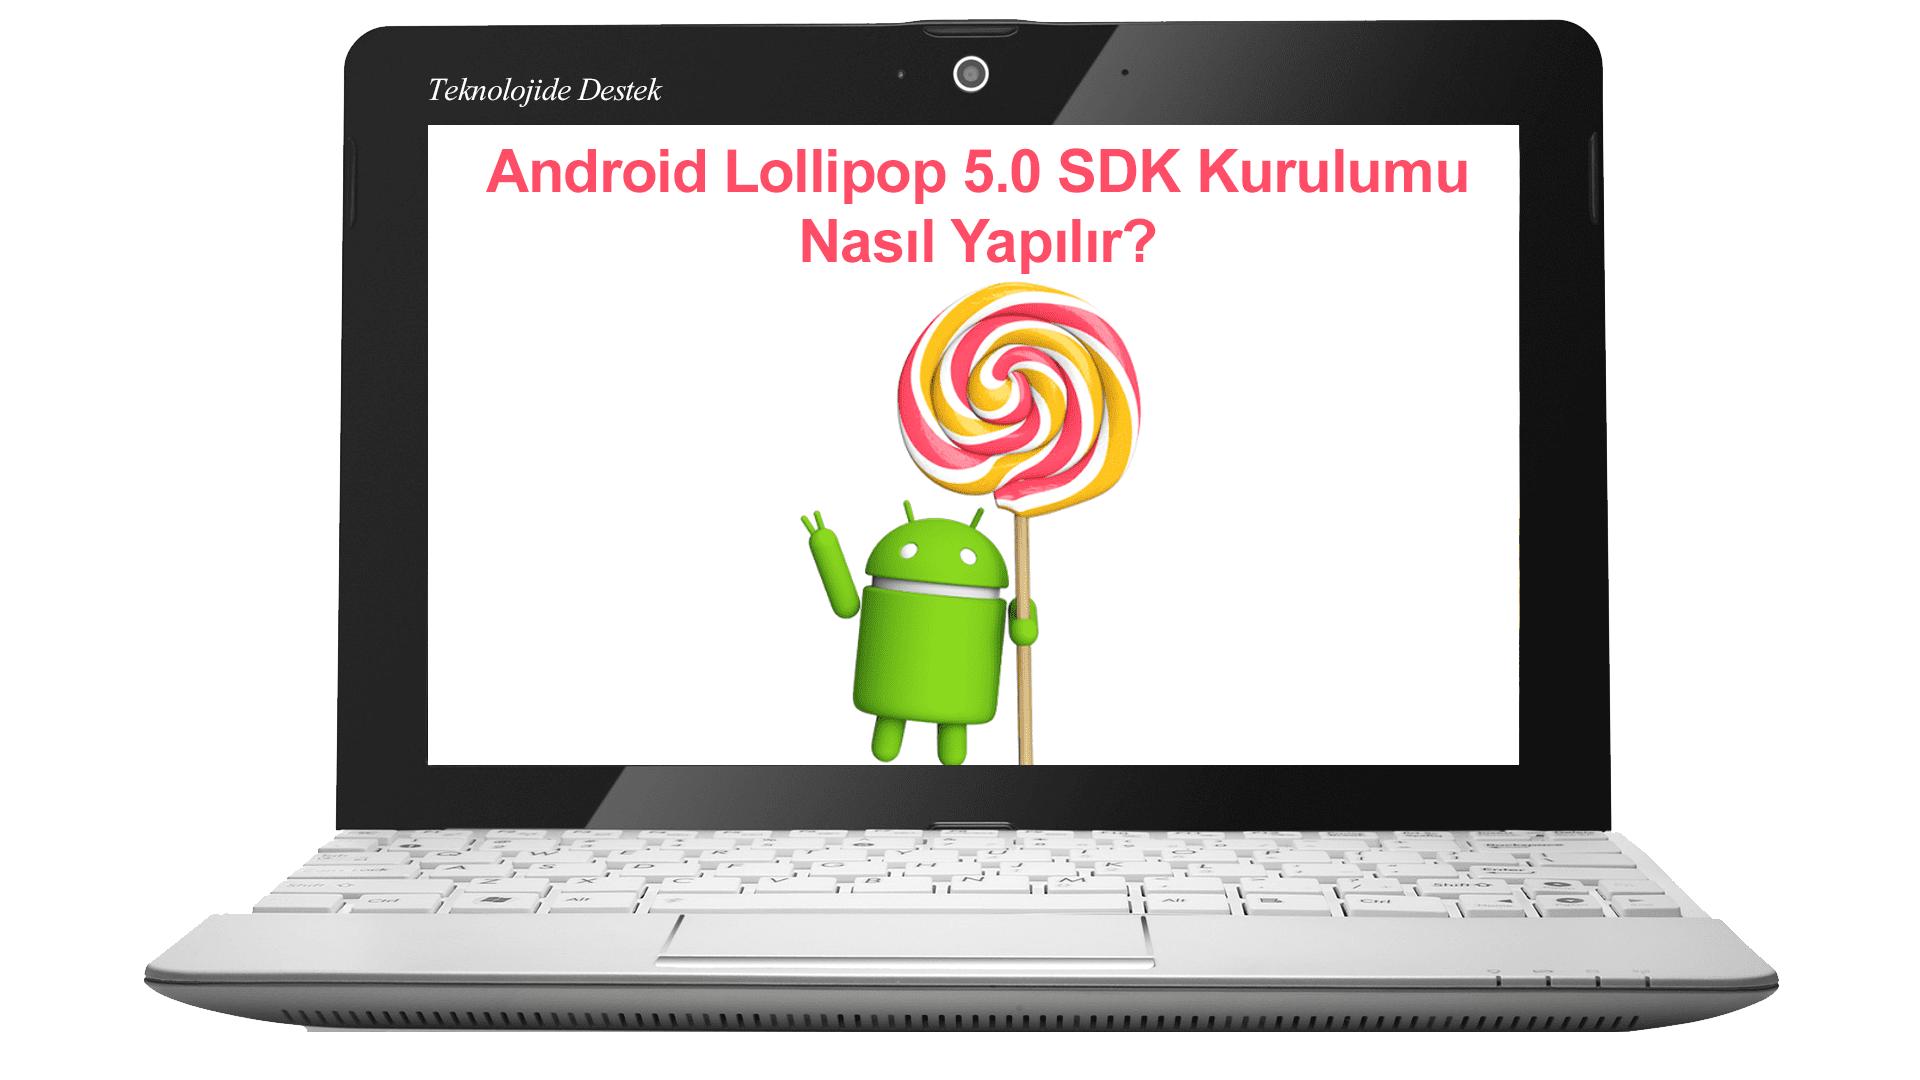 Install Android L SDK on PC, Install Android L SDK on Computer, Android L SDK Kurulumu Nasıl Yapılır, Android Lollipop SDK Kurulumu, Android L SDK Kurulumu, Android 5.0 SDK Kurulumu, SDK Nedir, Android L, Android 5.0,